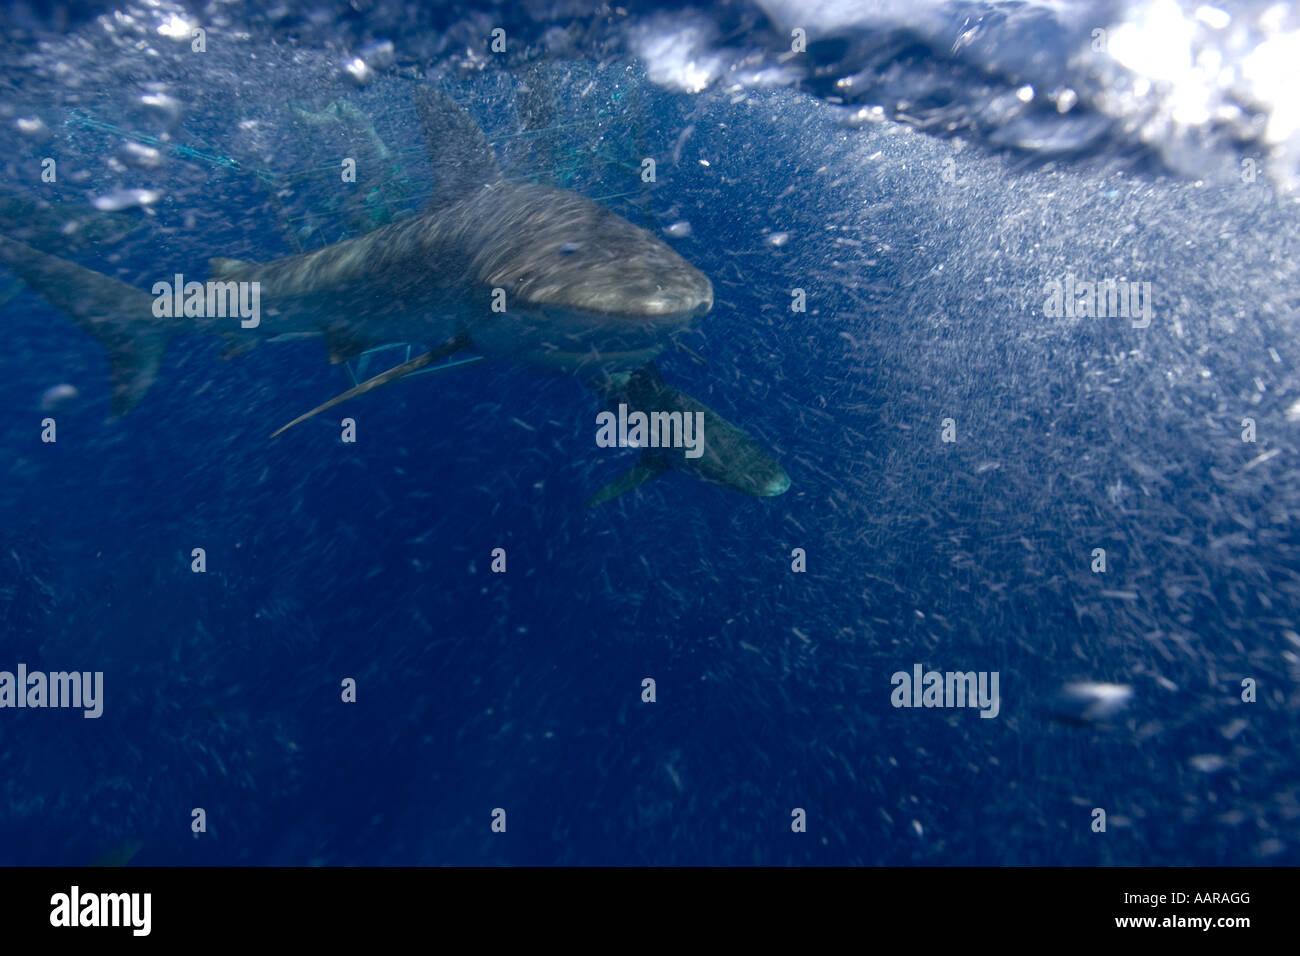 Galapagos sharks Carcharhinus galapagensis Oahu Hawaii Stock Photo